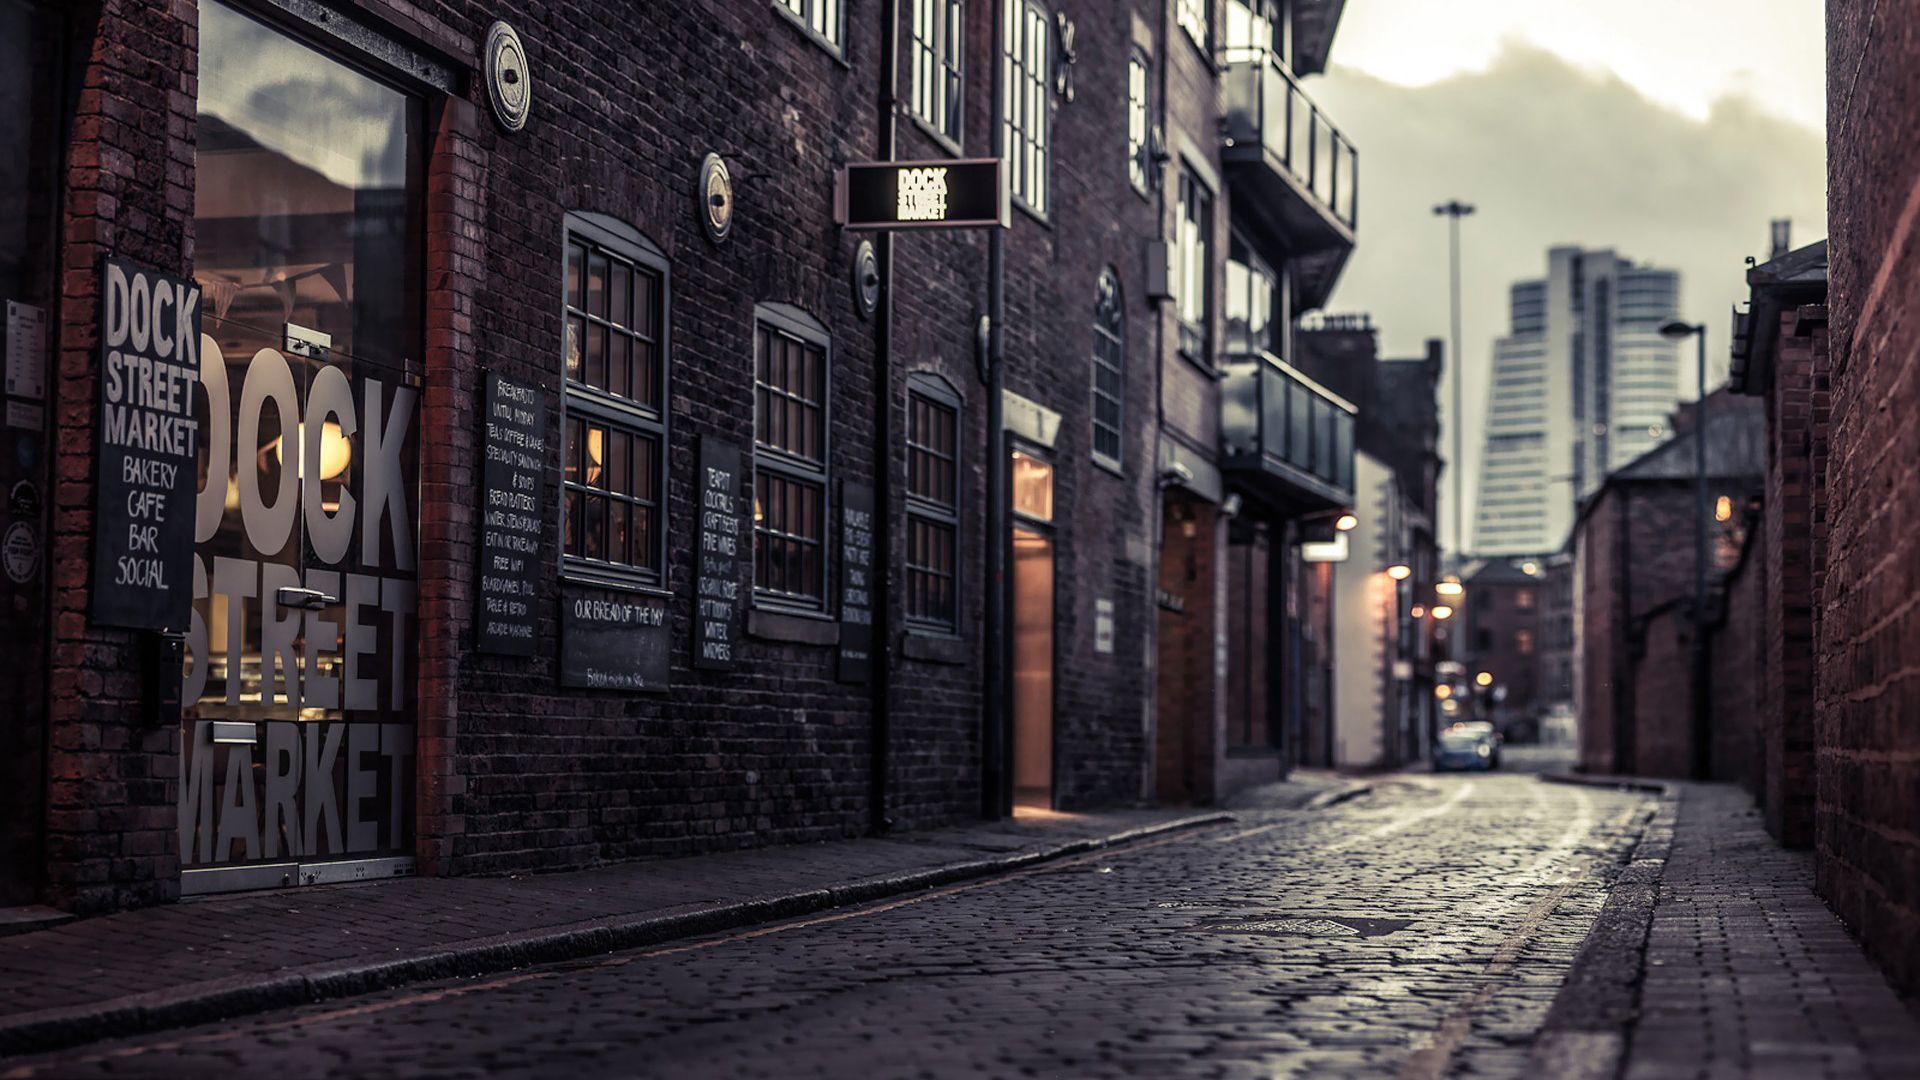 Street Wallpaper; Street Wallpaper; Street Wallpaper ...